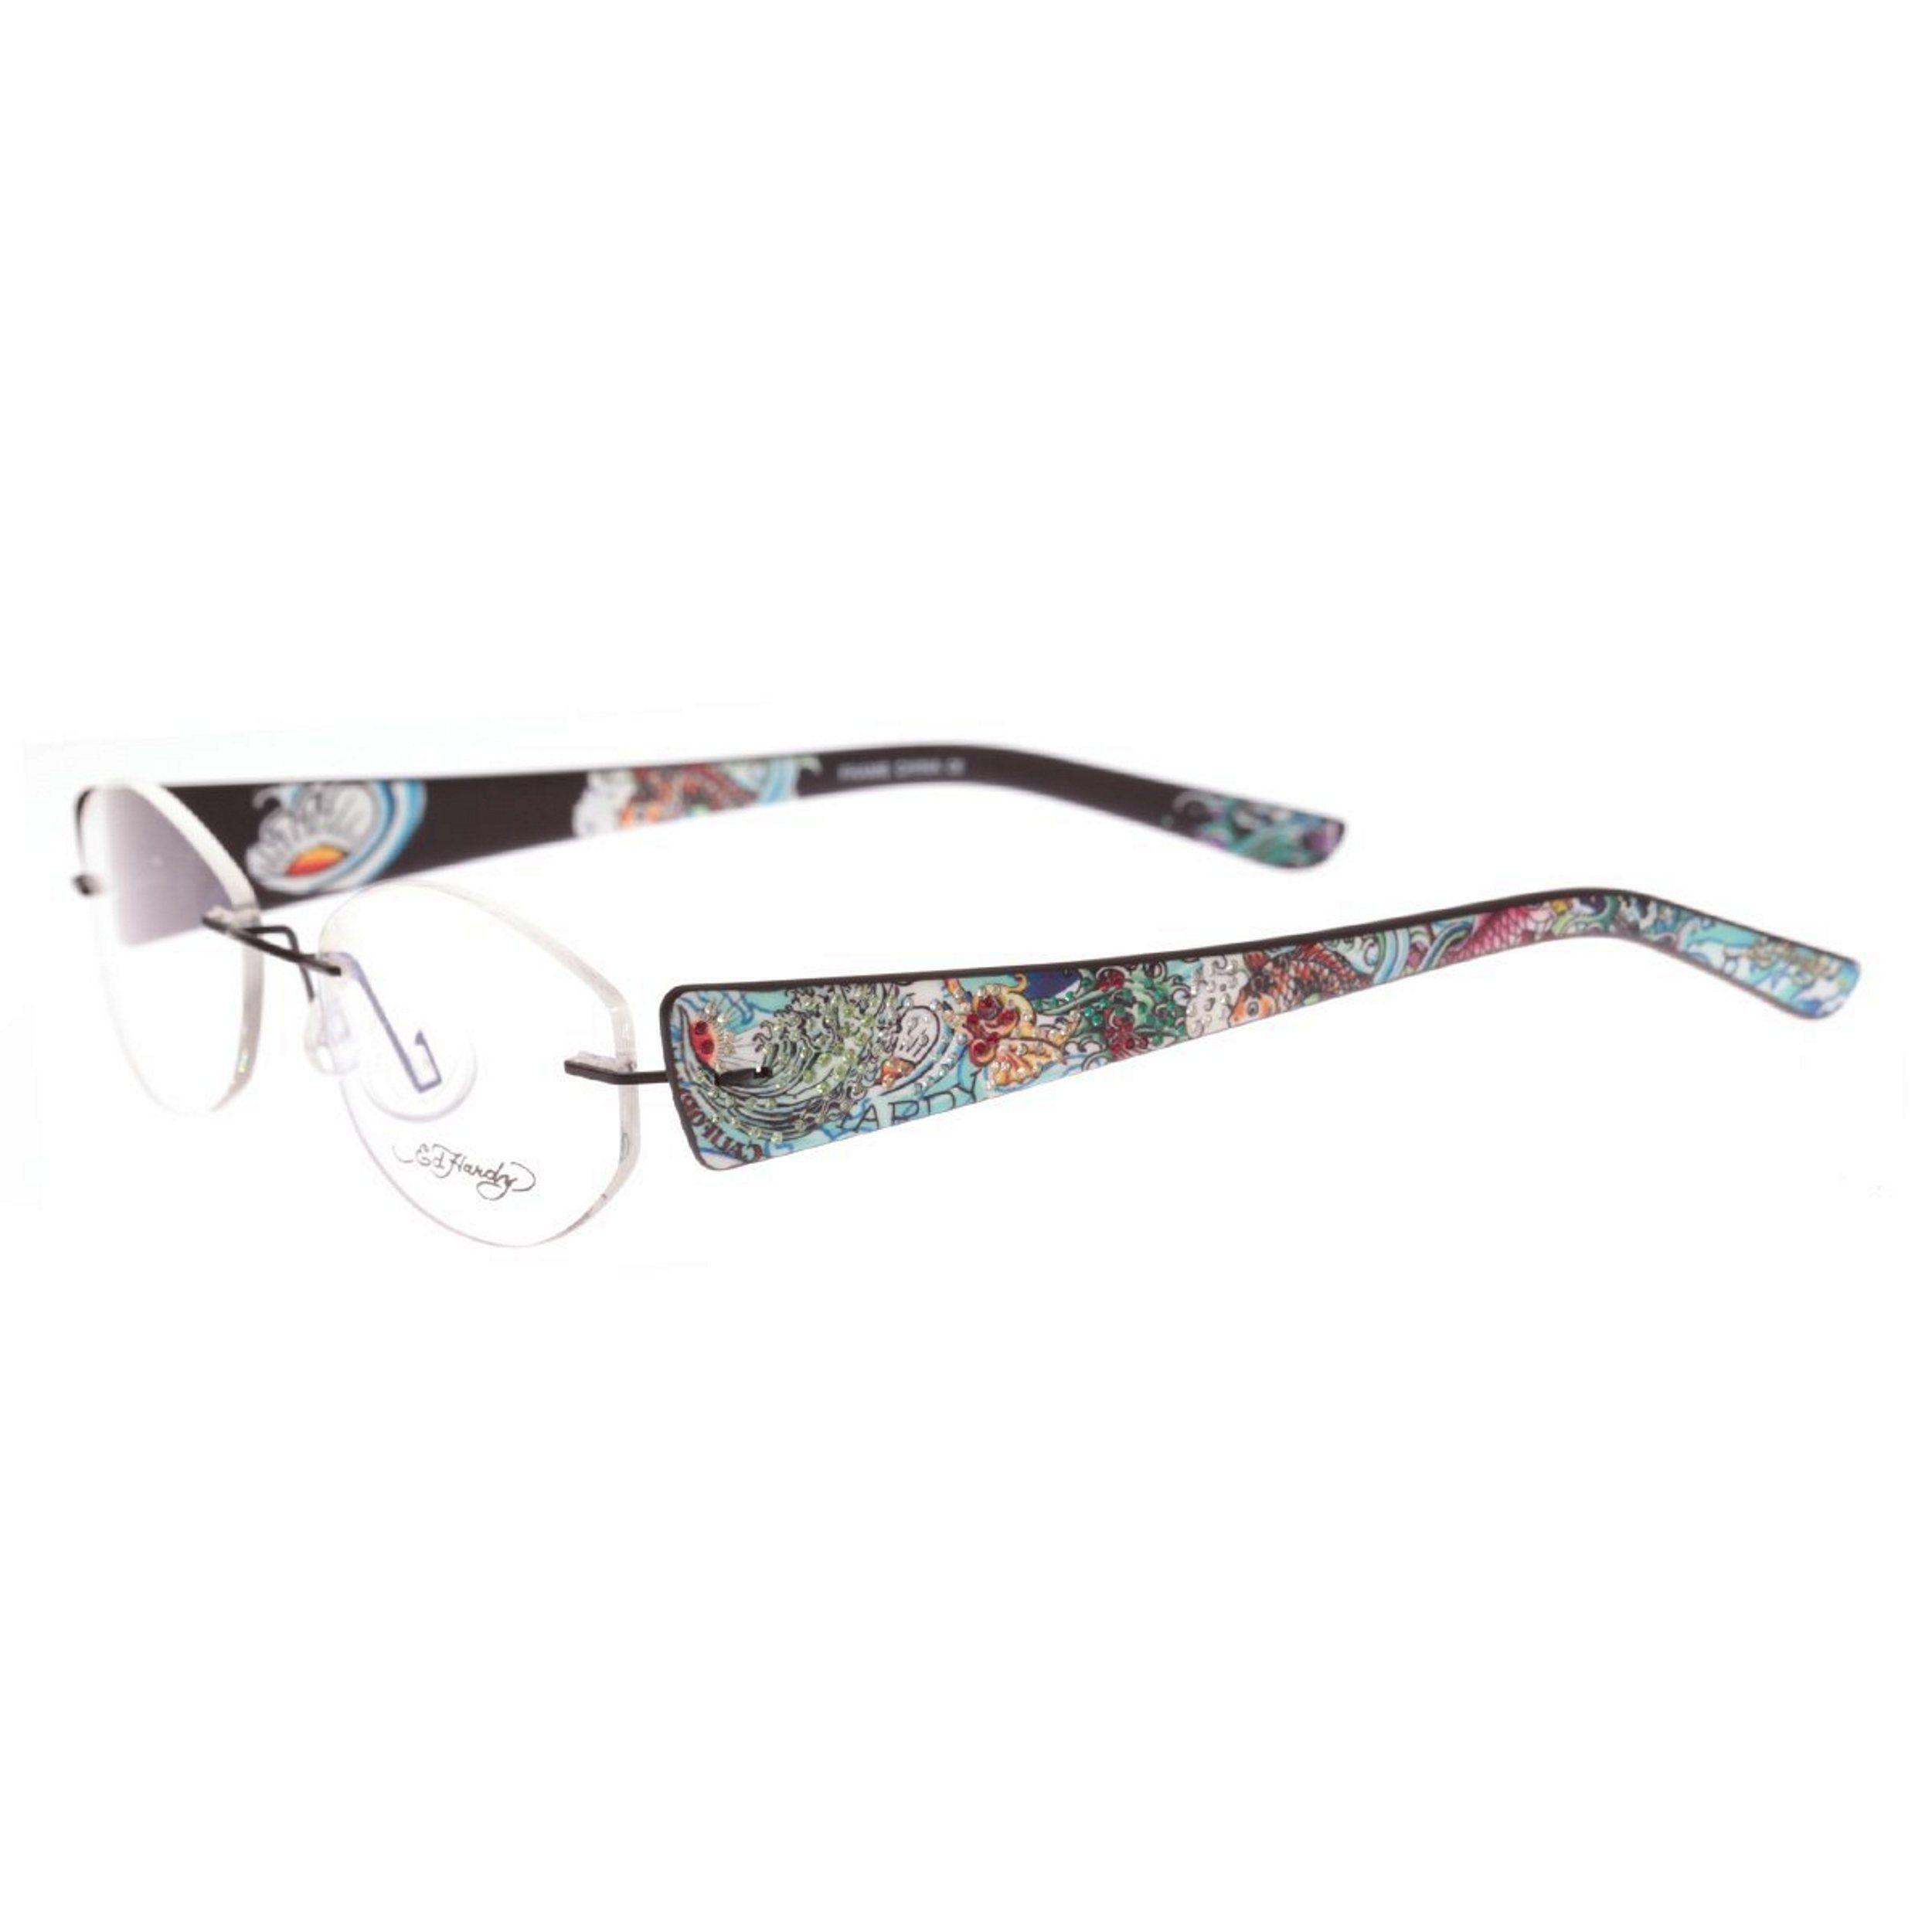 Ed Hardy EHL-818 Lite Designer Eyeglasses | Ed hardy | Pinterest ...